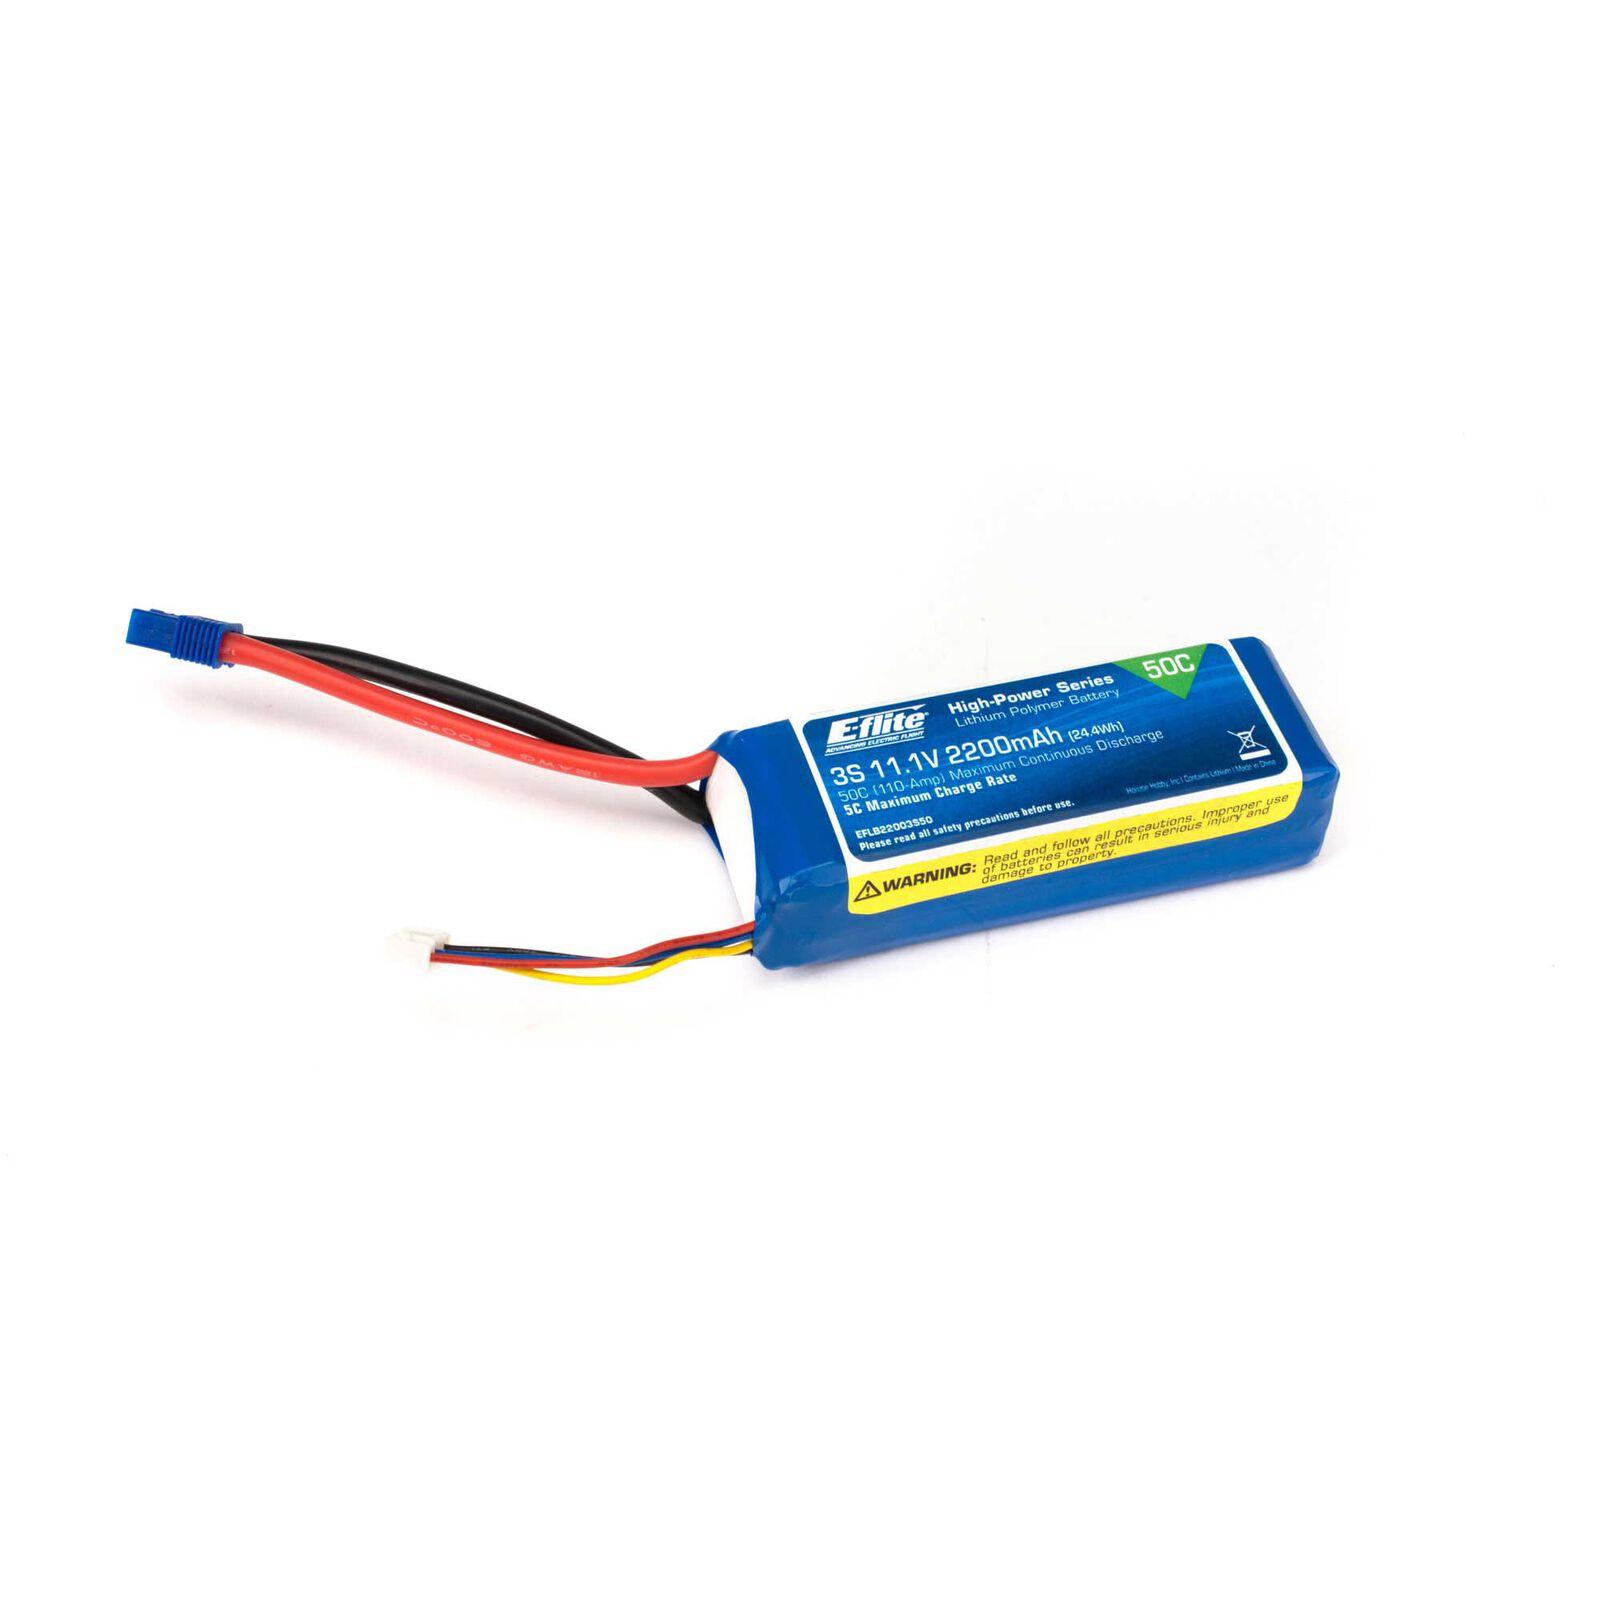 11.1V 2200mAh 3S 50C LiPo Battery: EC3